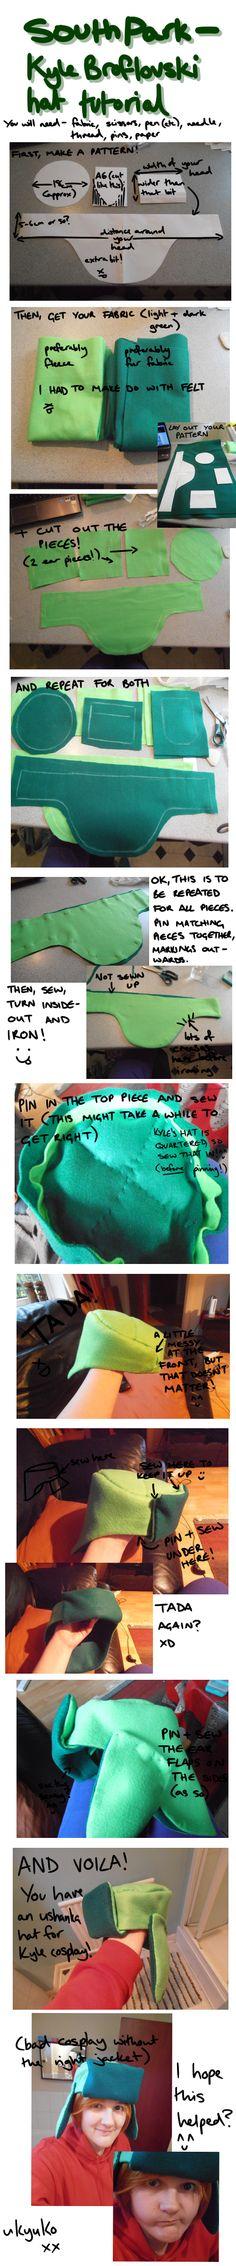 South Park Cosplay - Kyle Hat Tutorial by KyuketsukiKokoro.deviantart.com on @DeviantArt